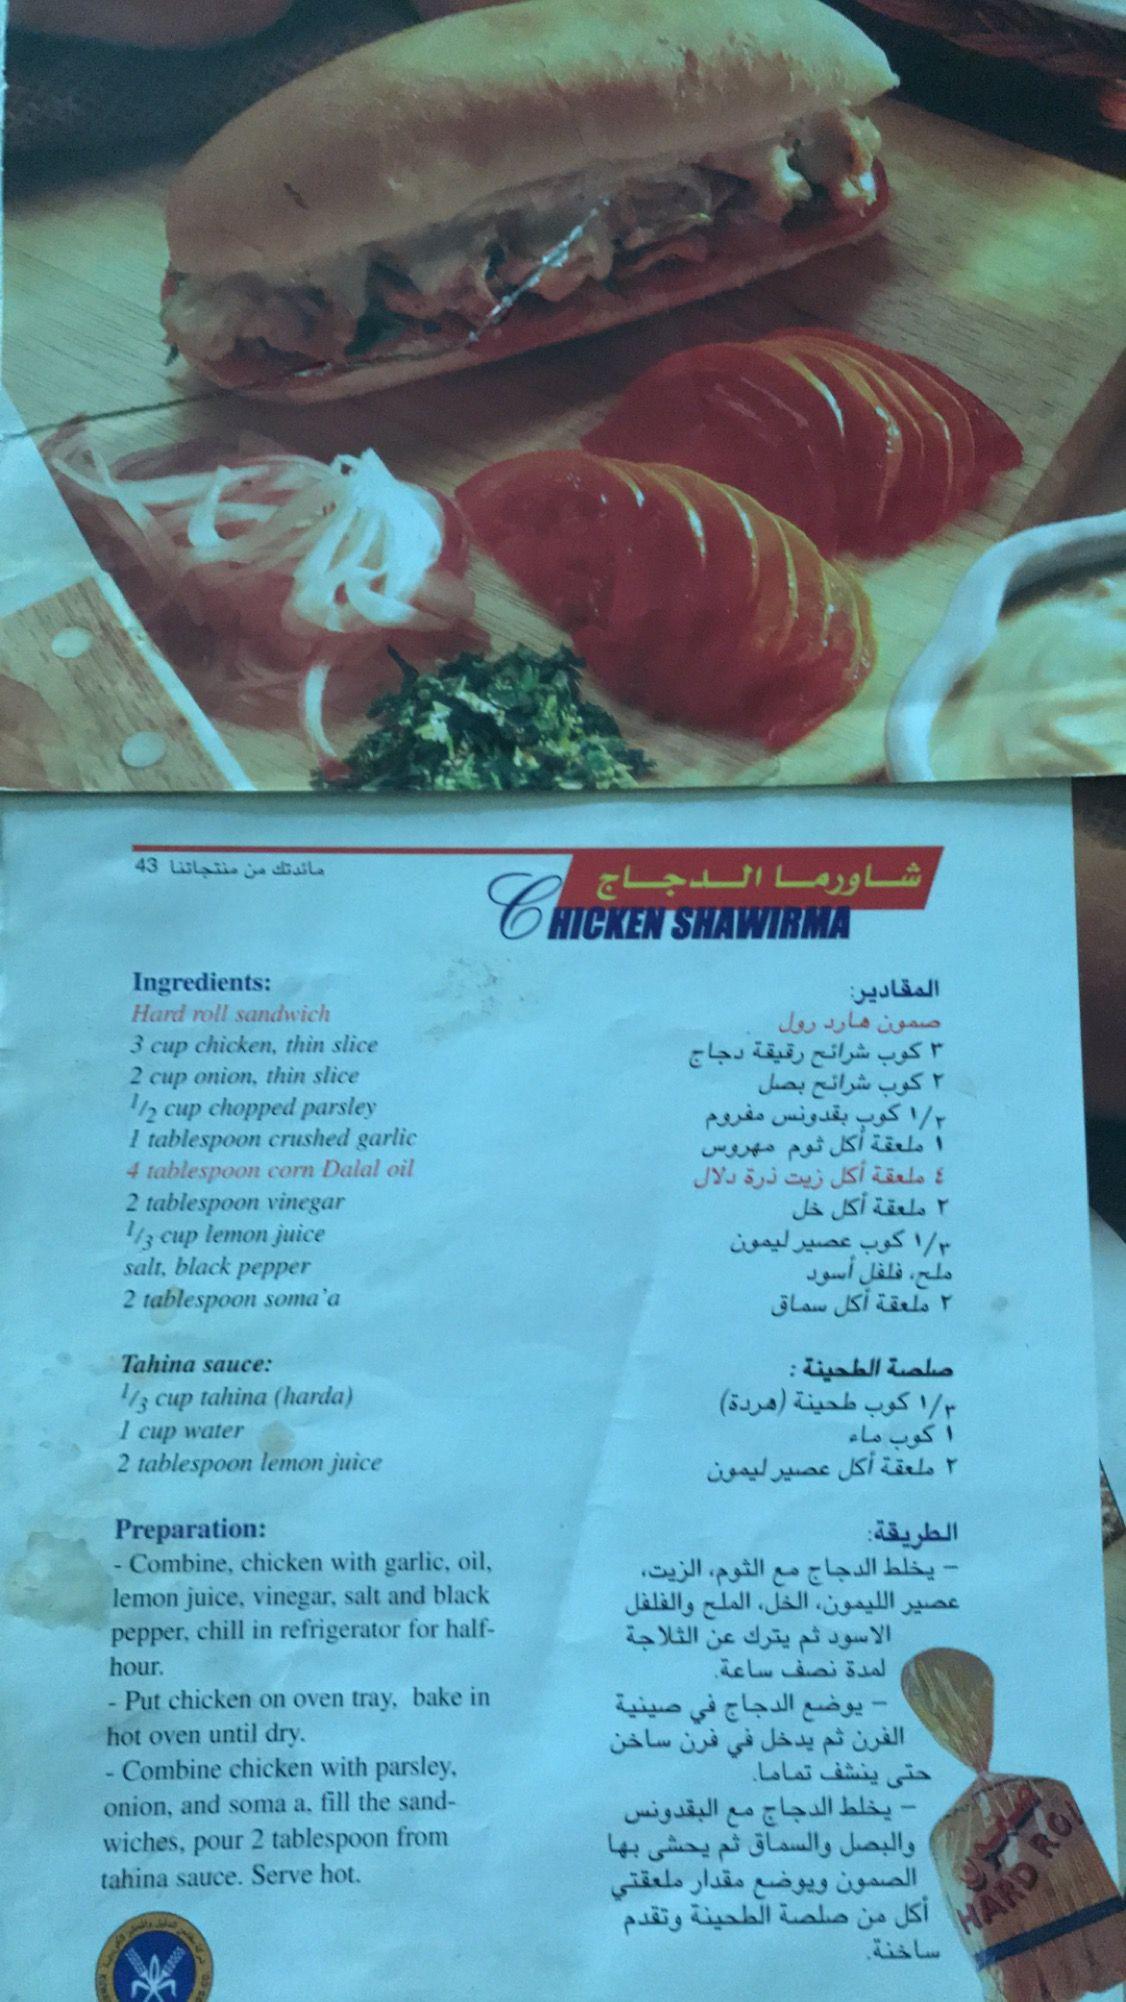 شاورما الدجاج يم يمي لذيذه Stuffed Peppers Food 3 Cup Chicken